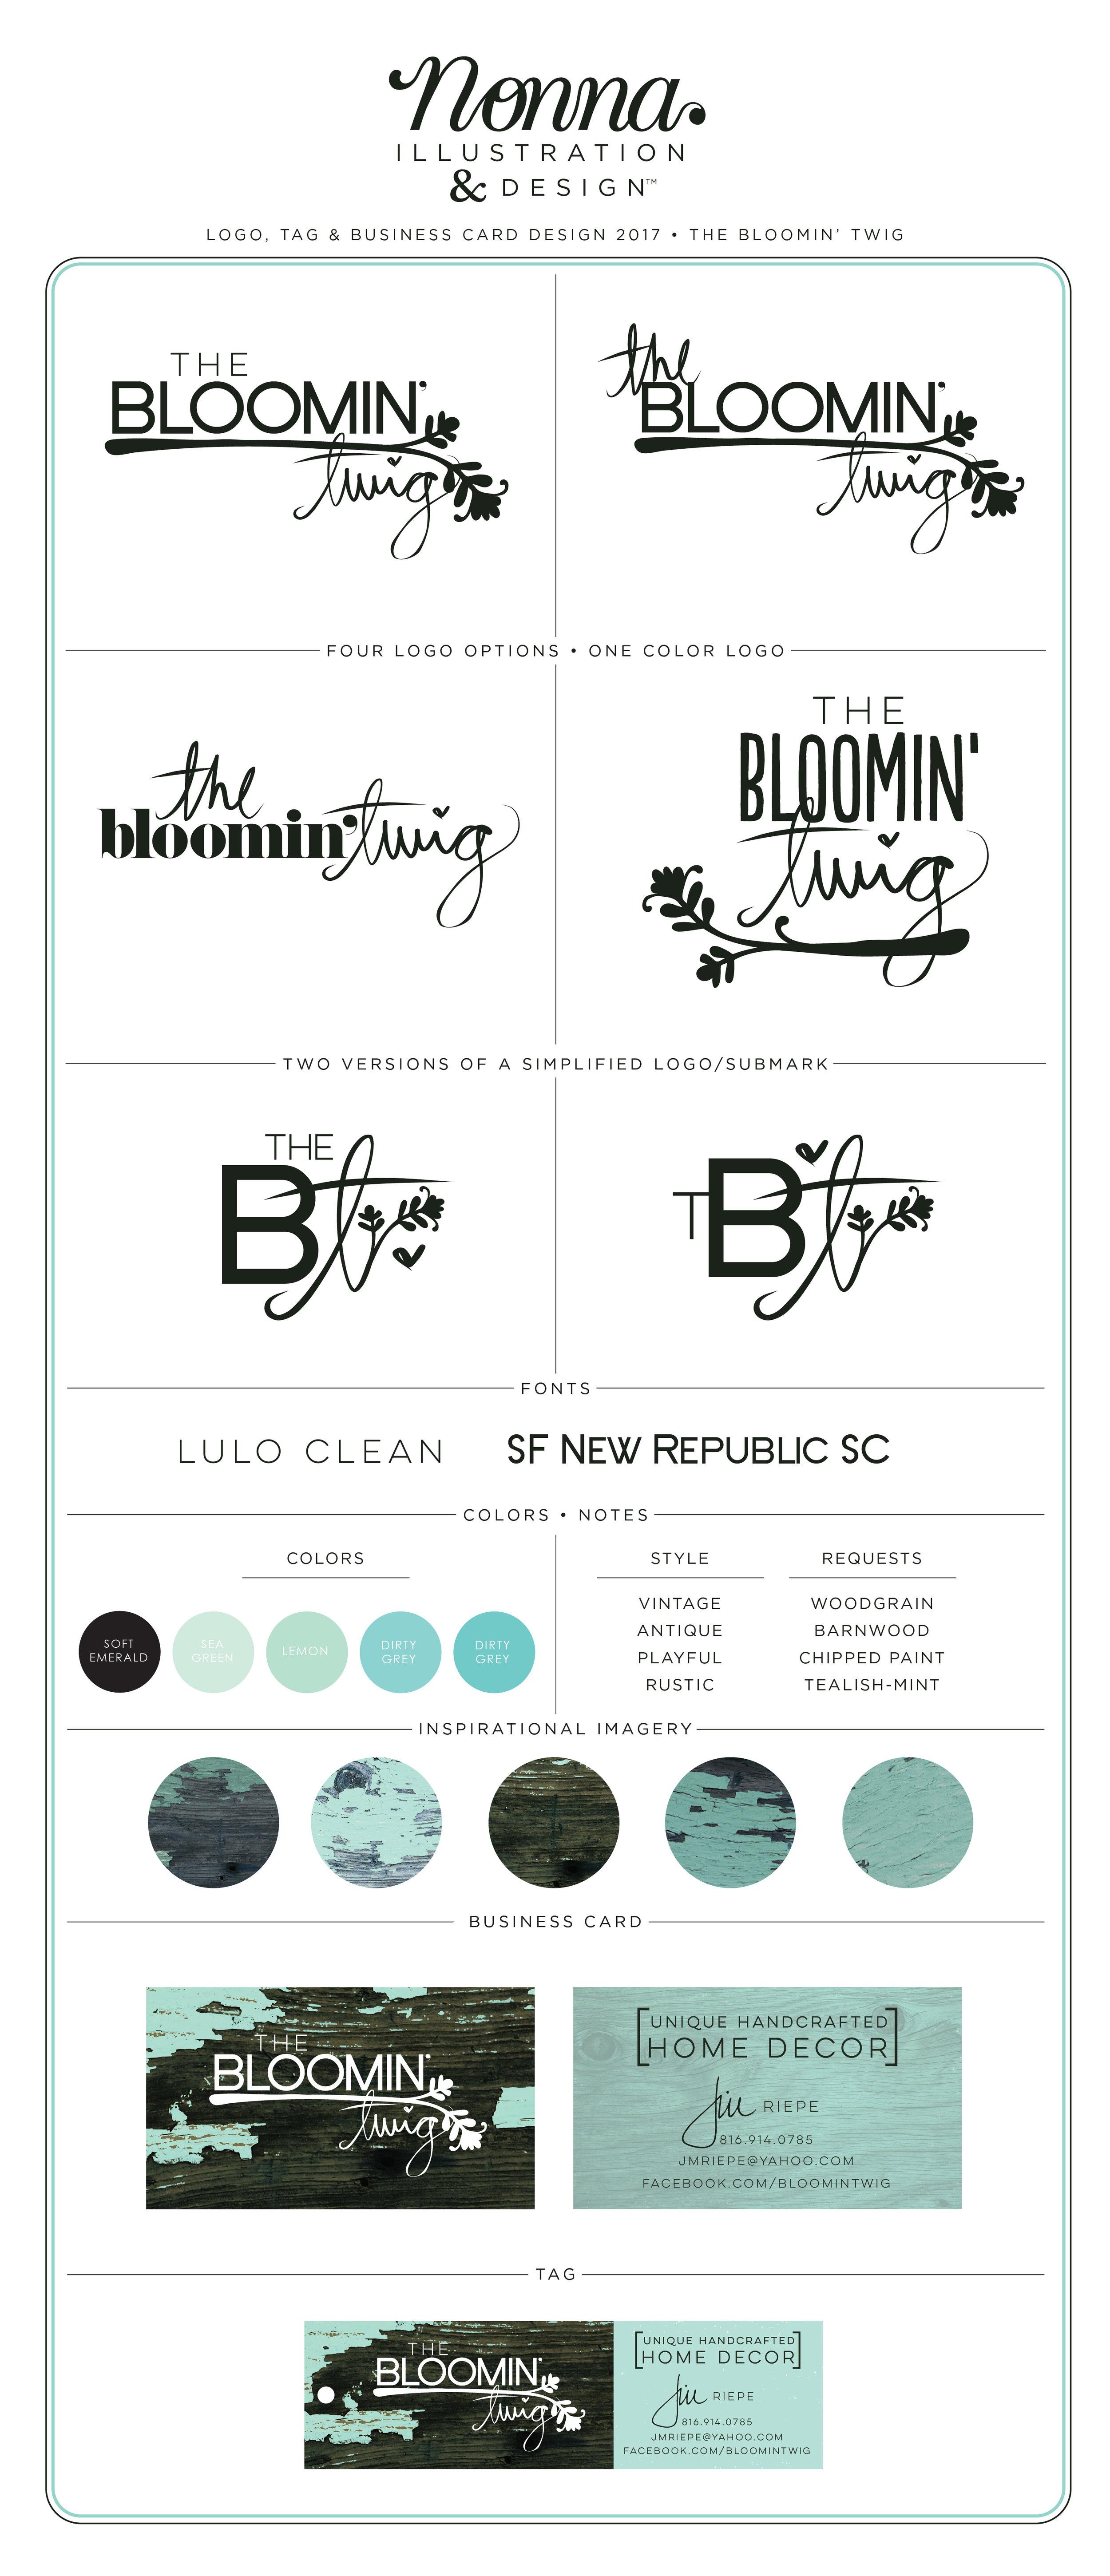 Custom Branding Identity The Bloomin Twig by Nonna Illustration & Design nonnaiandd